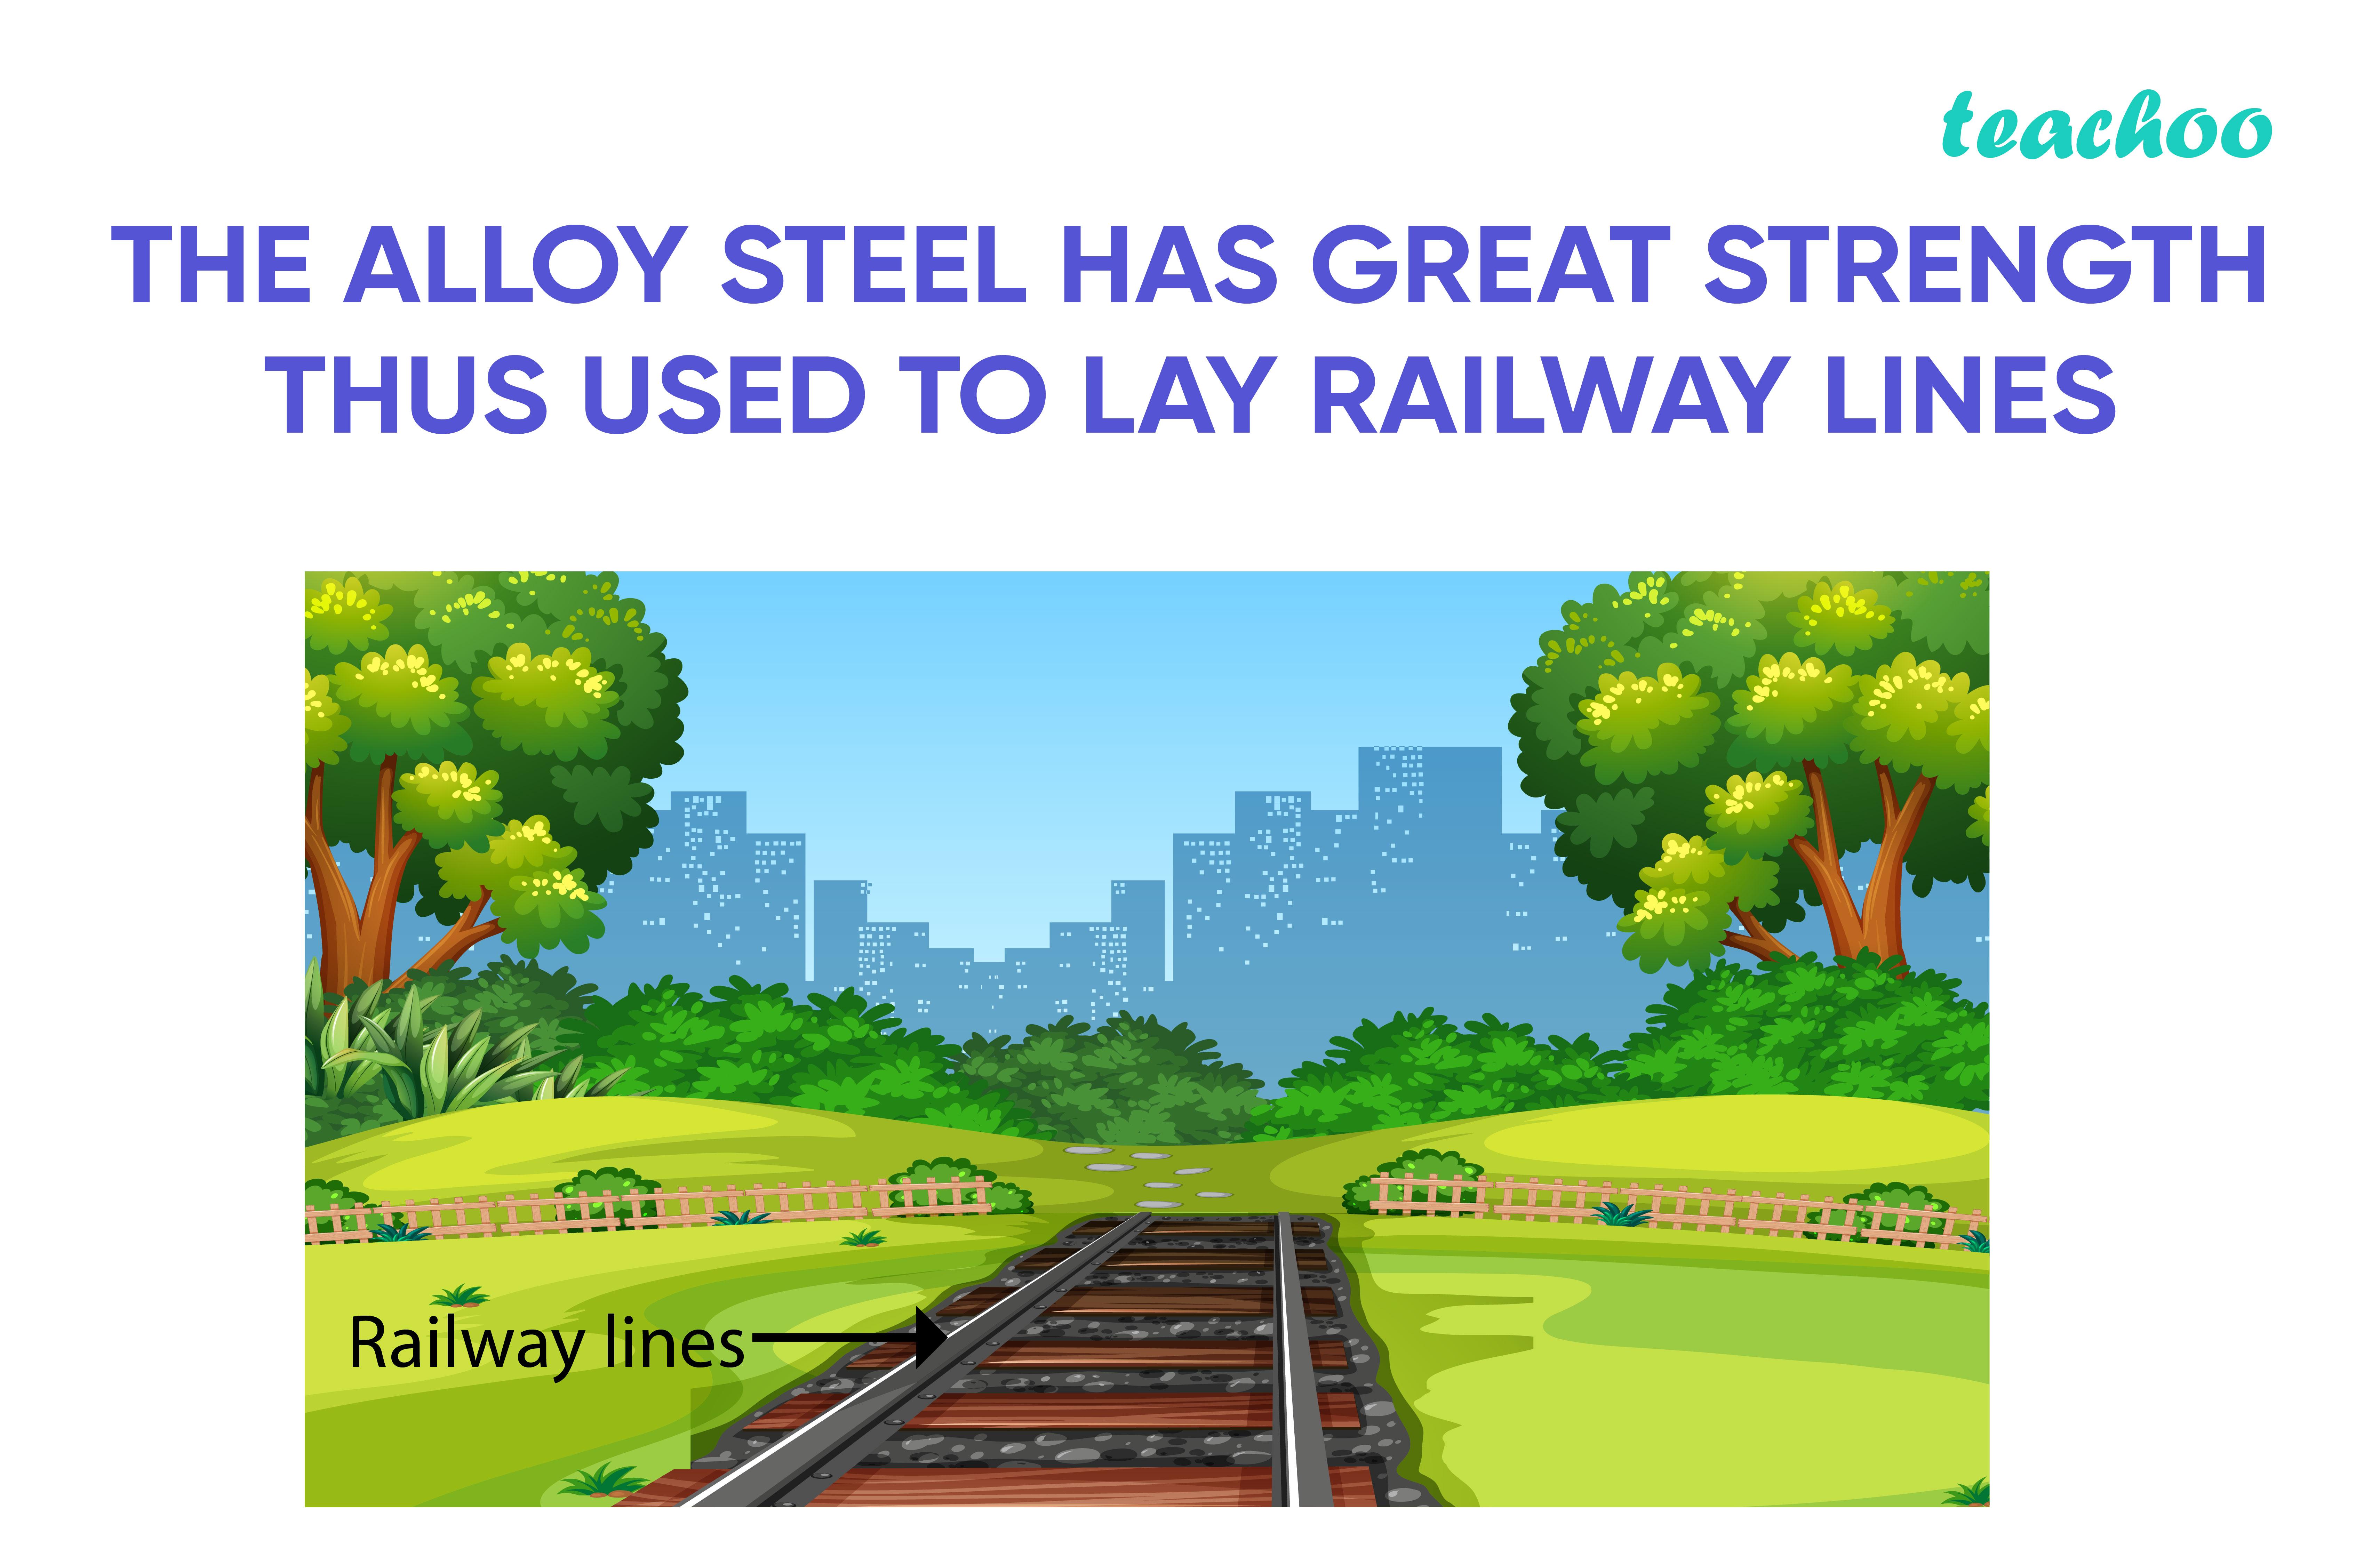 The alloy steel has great strength thus used to lay railway lines-Teachoo-01.jpg